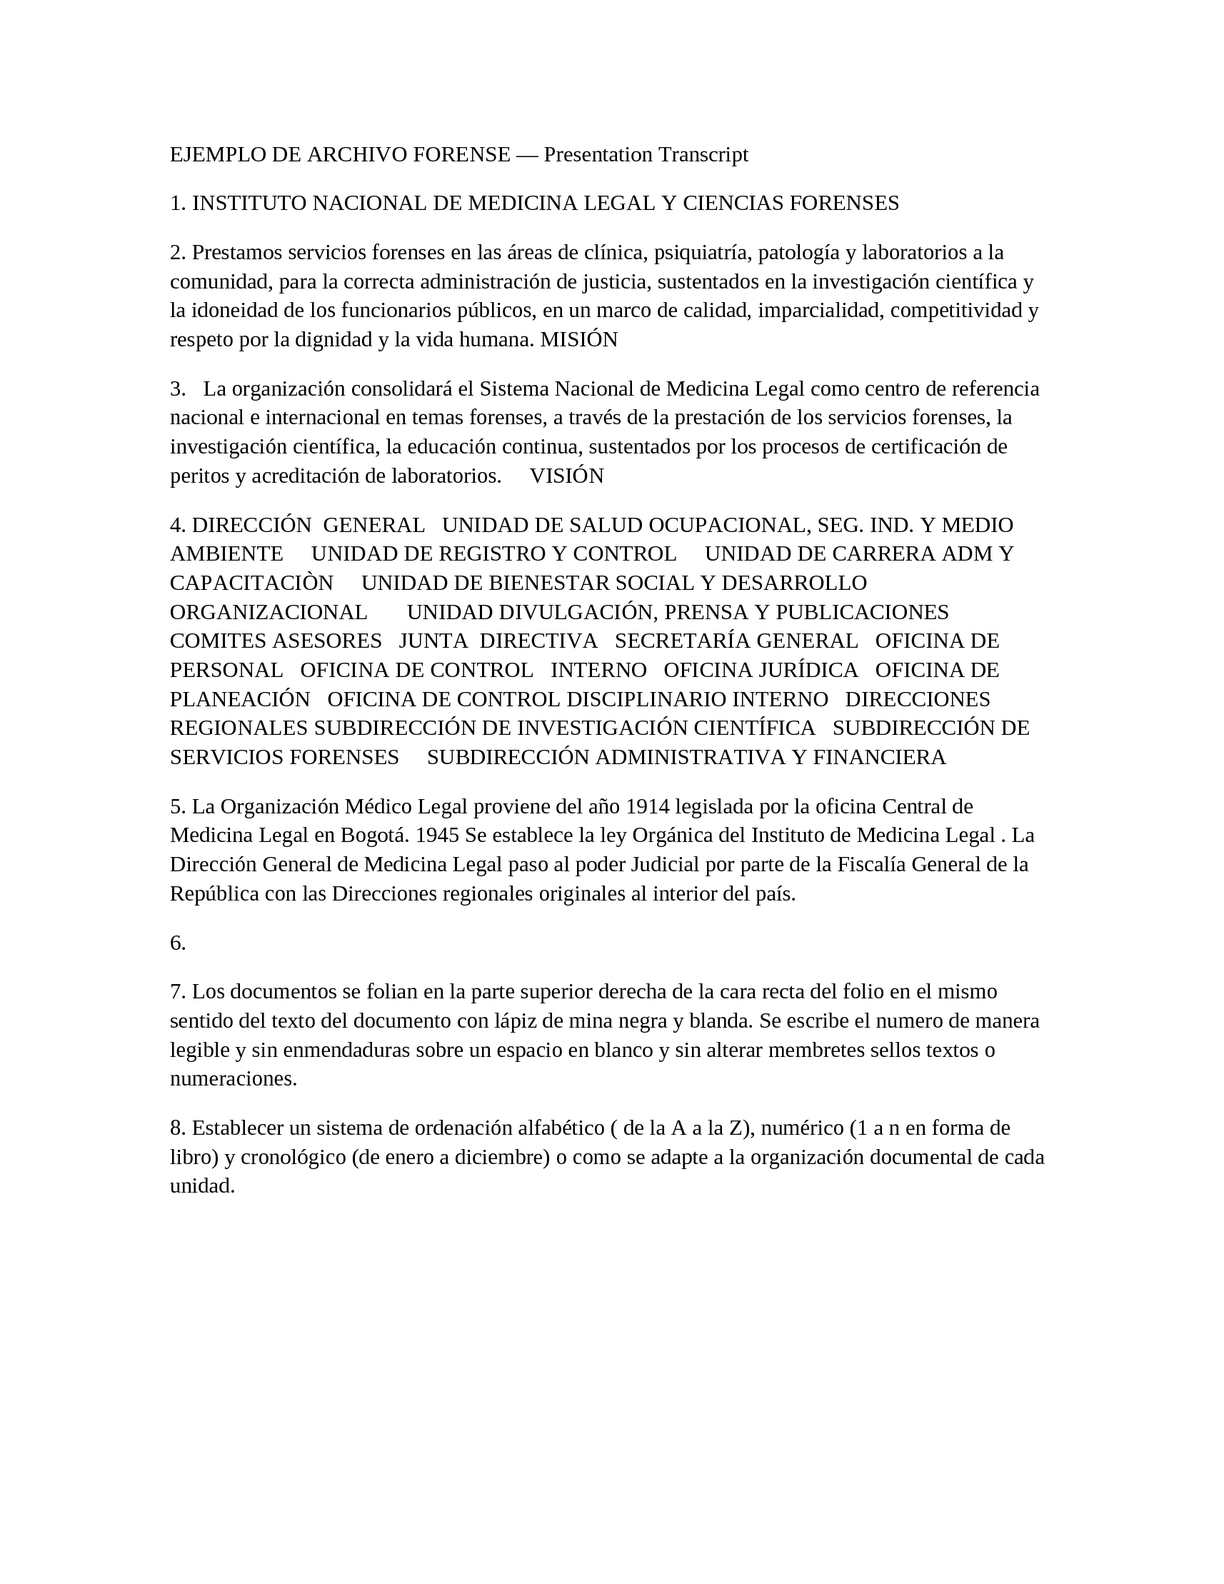 Calaméo - EJEMPLO DE ARCHIVO FORENSE